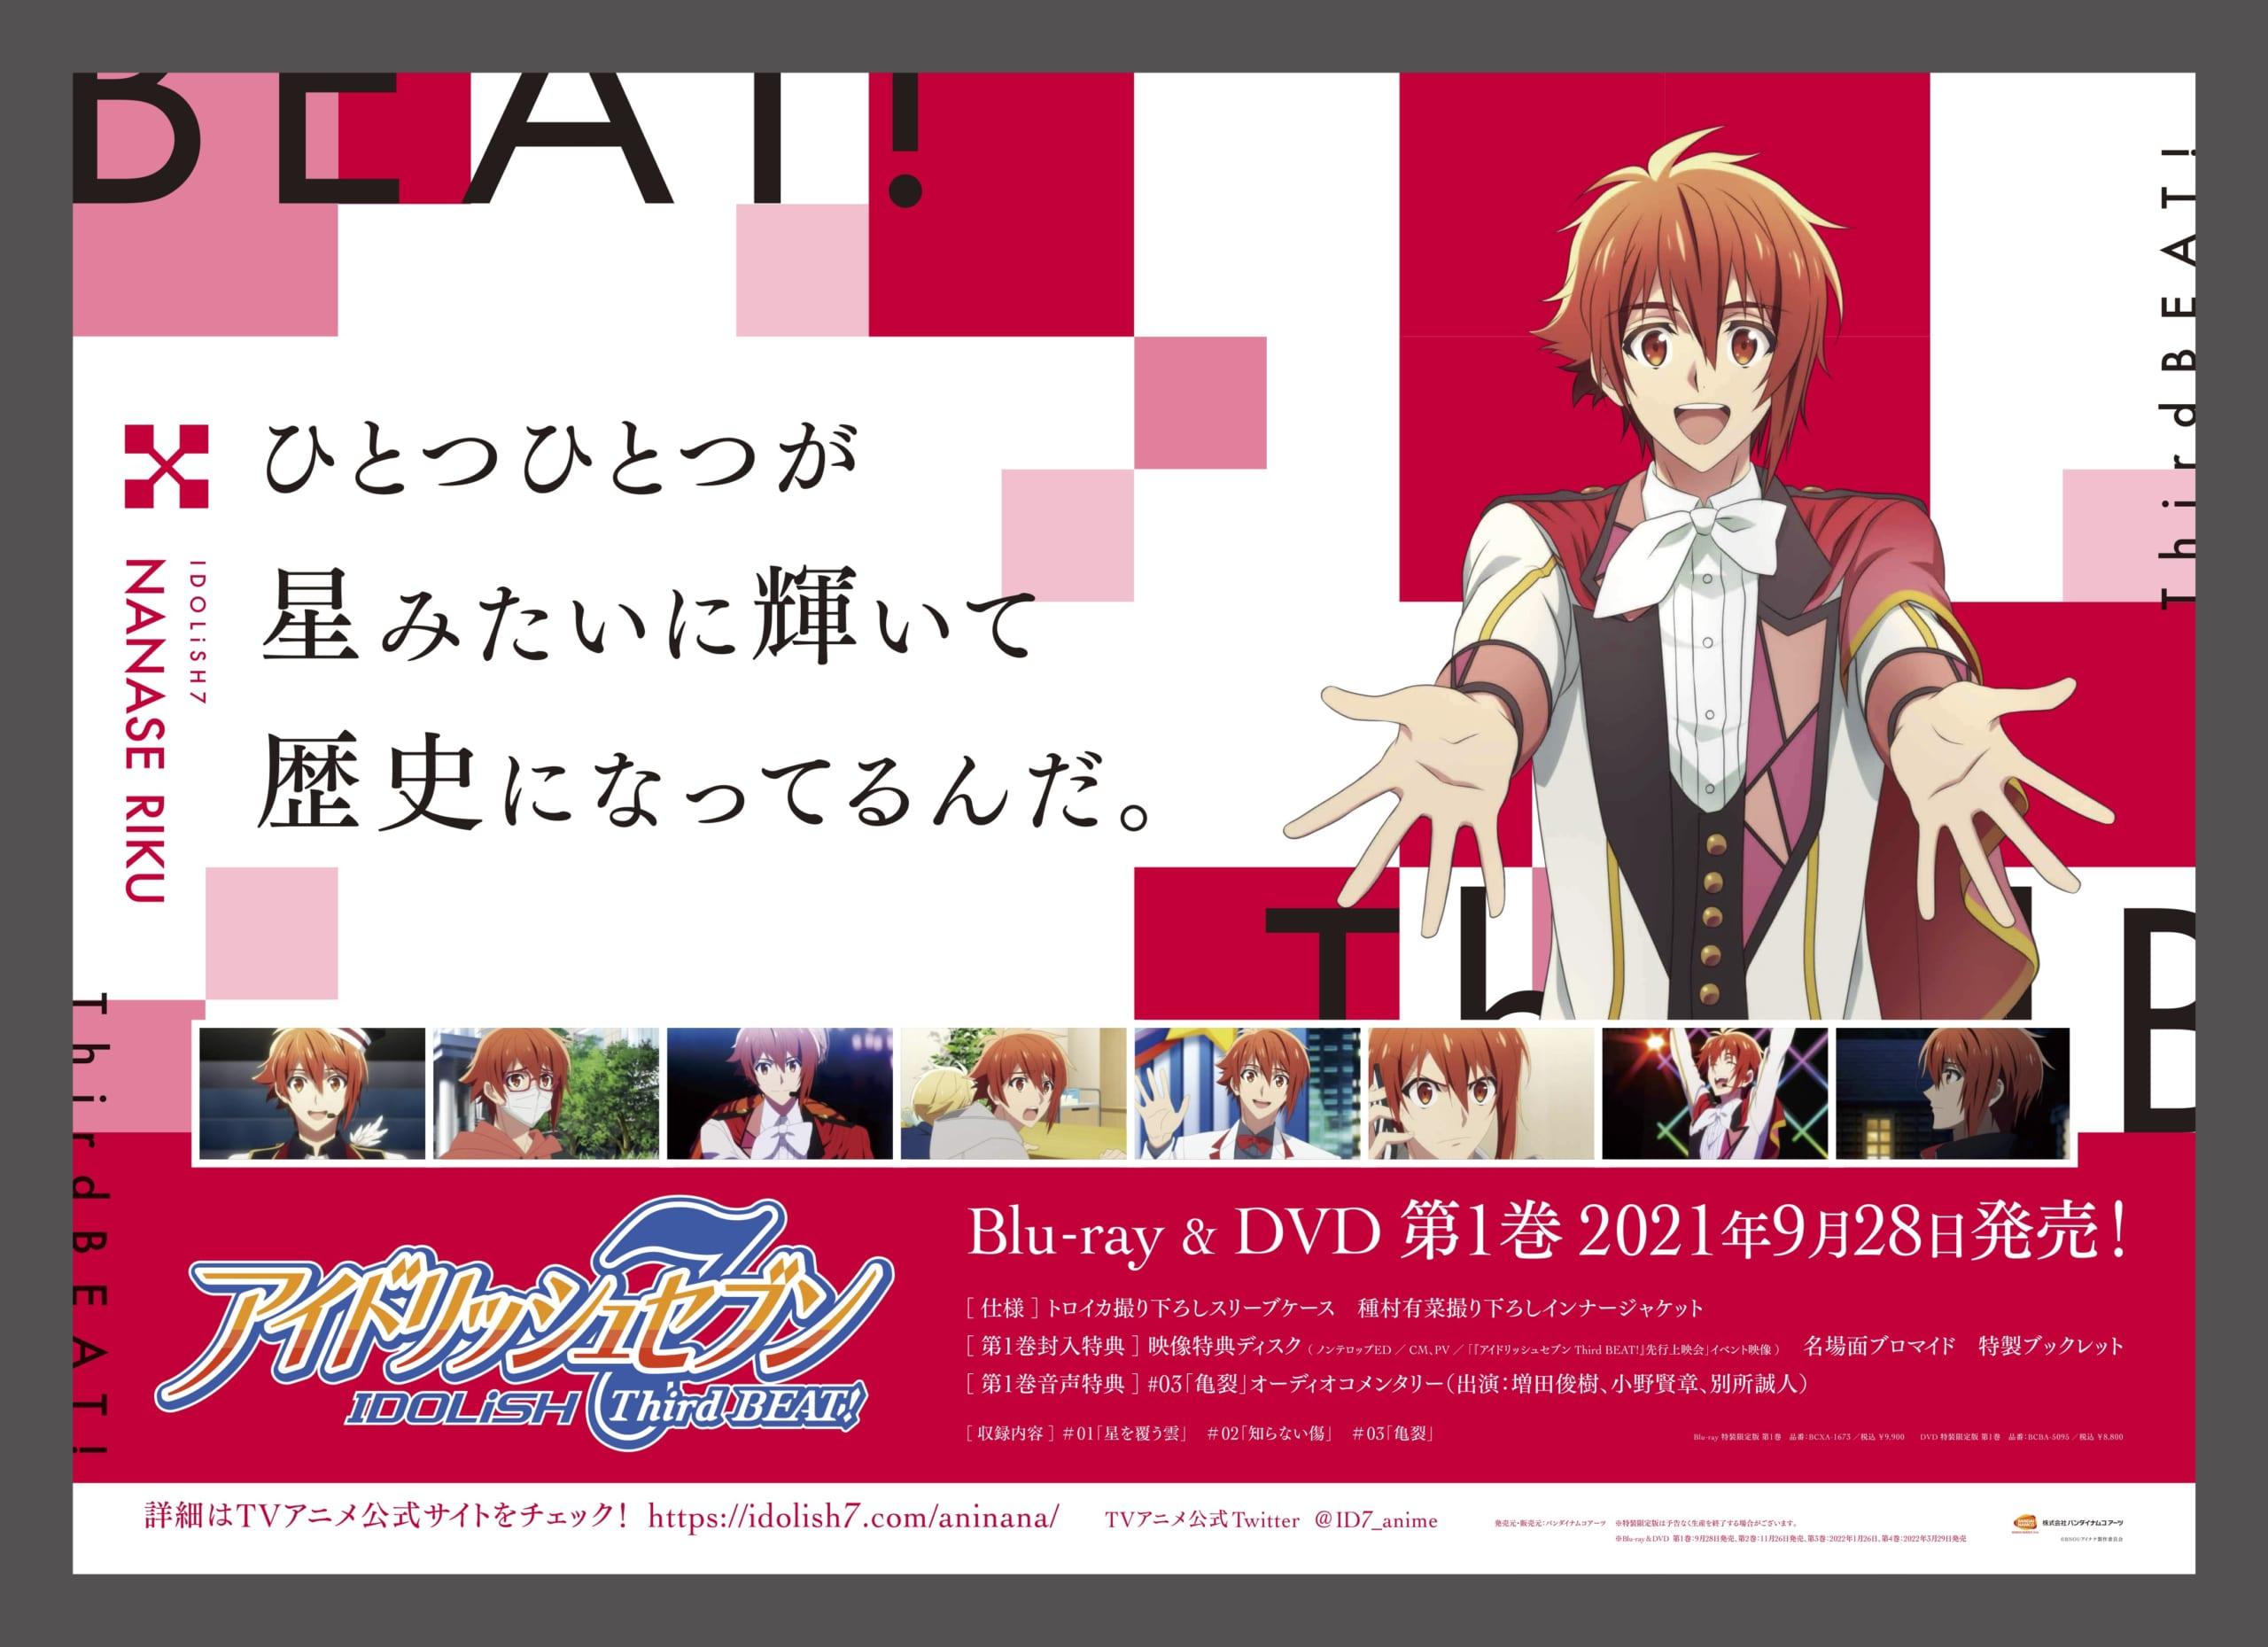 TVアニメ「アイドリッシュセブン Third BEAT!」駅広告七瀬陸